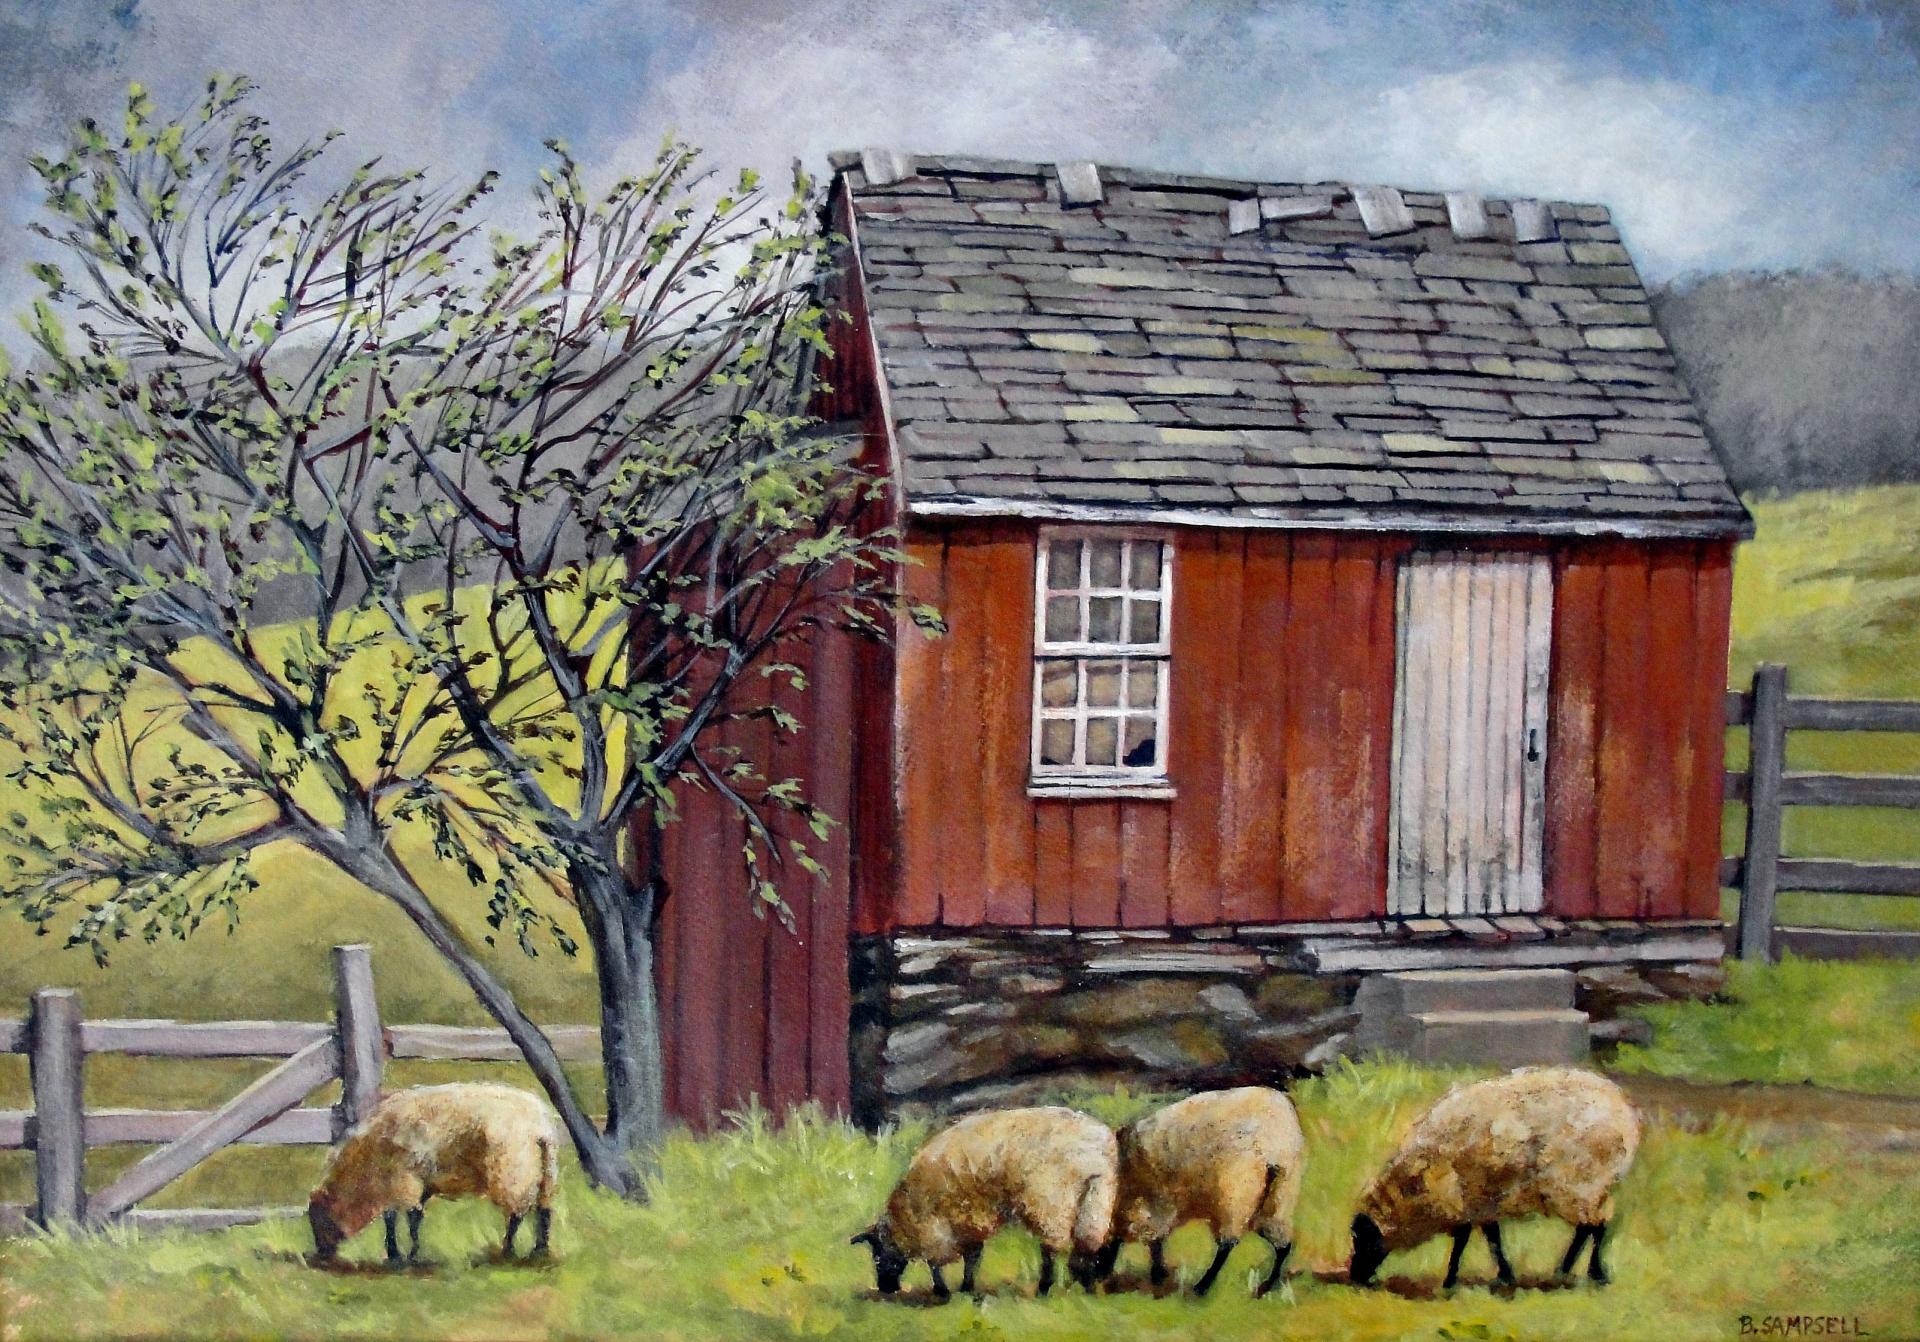 Sheep Shack